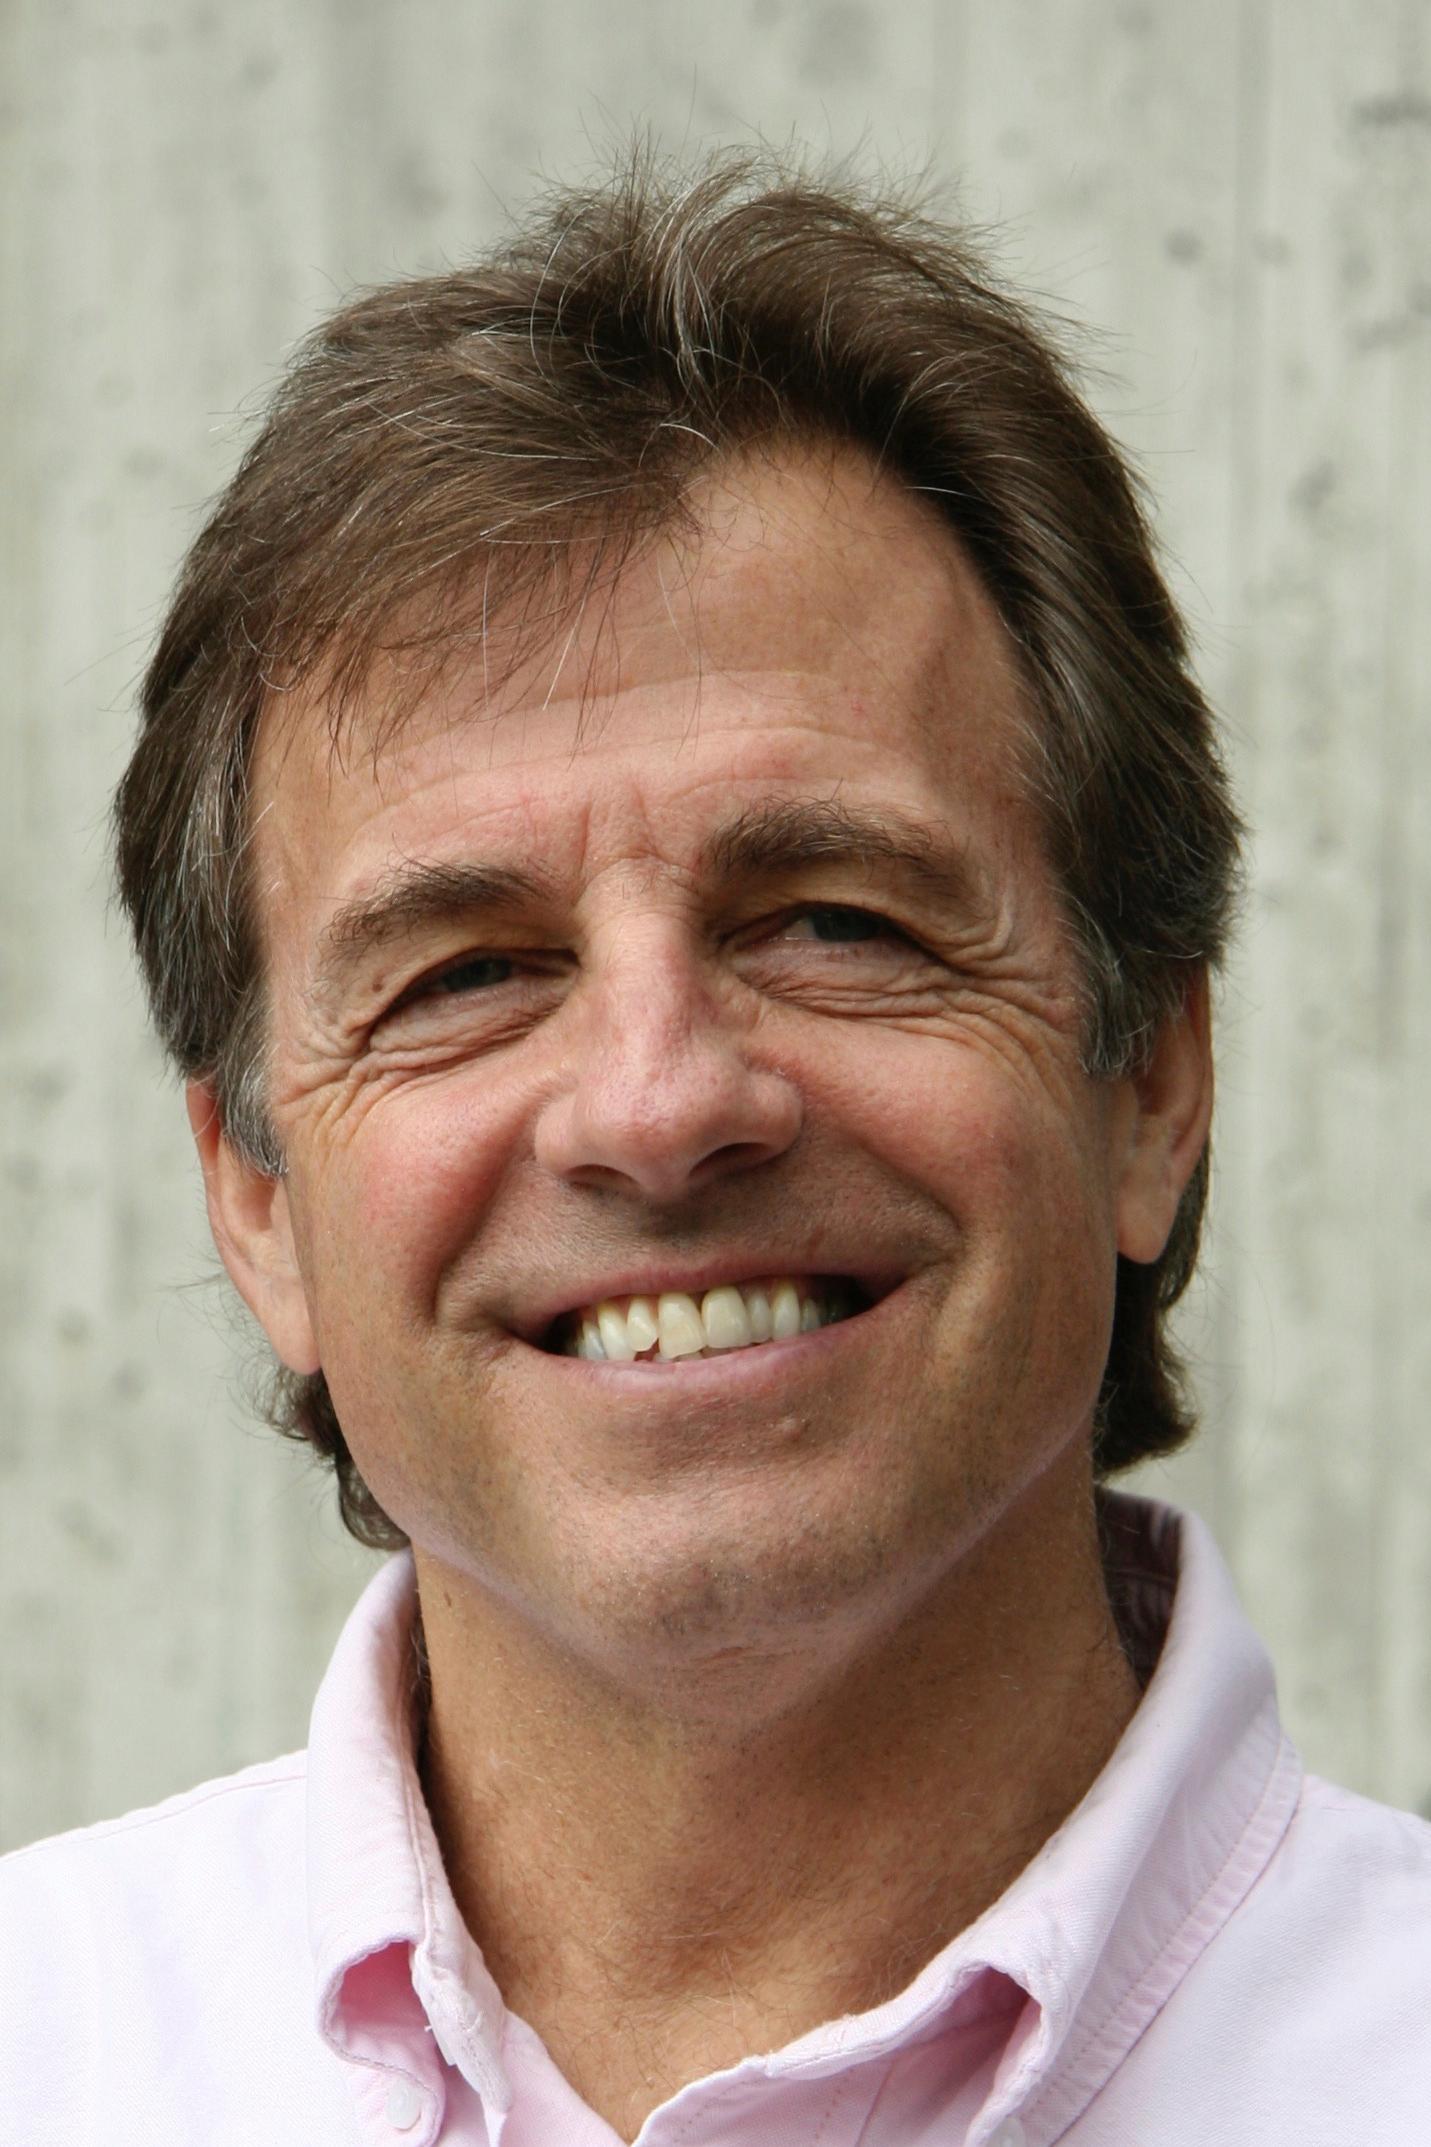 Tim Olmsted